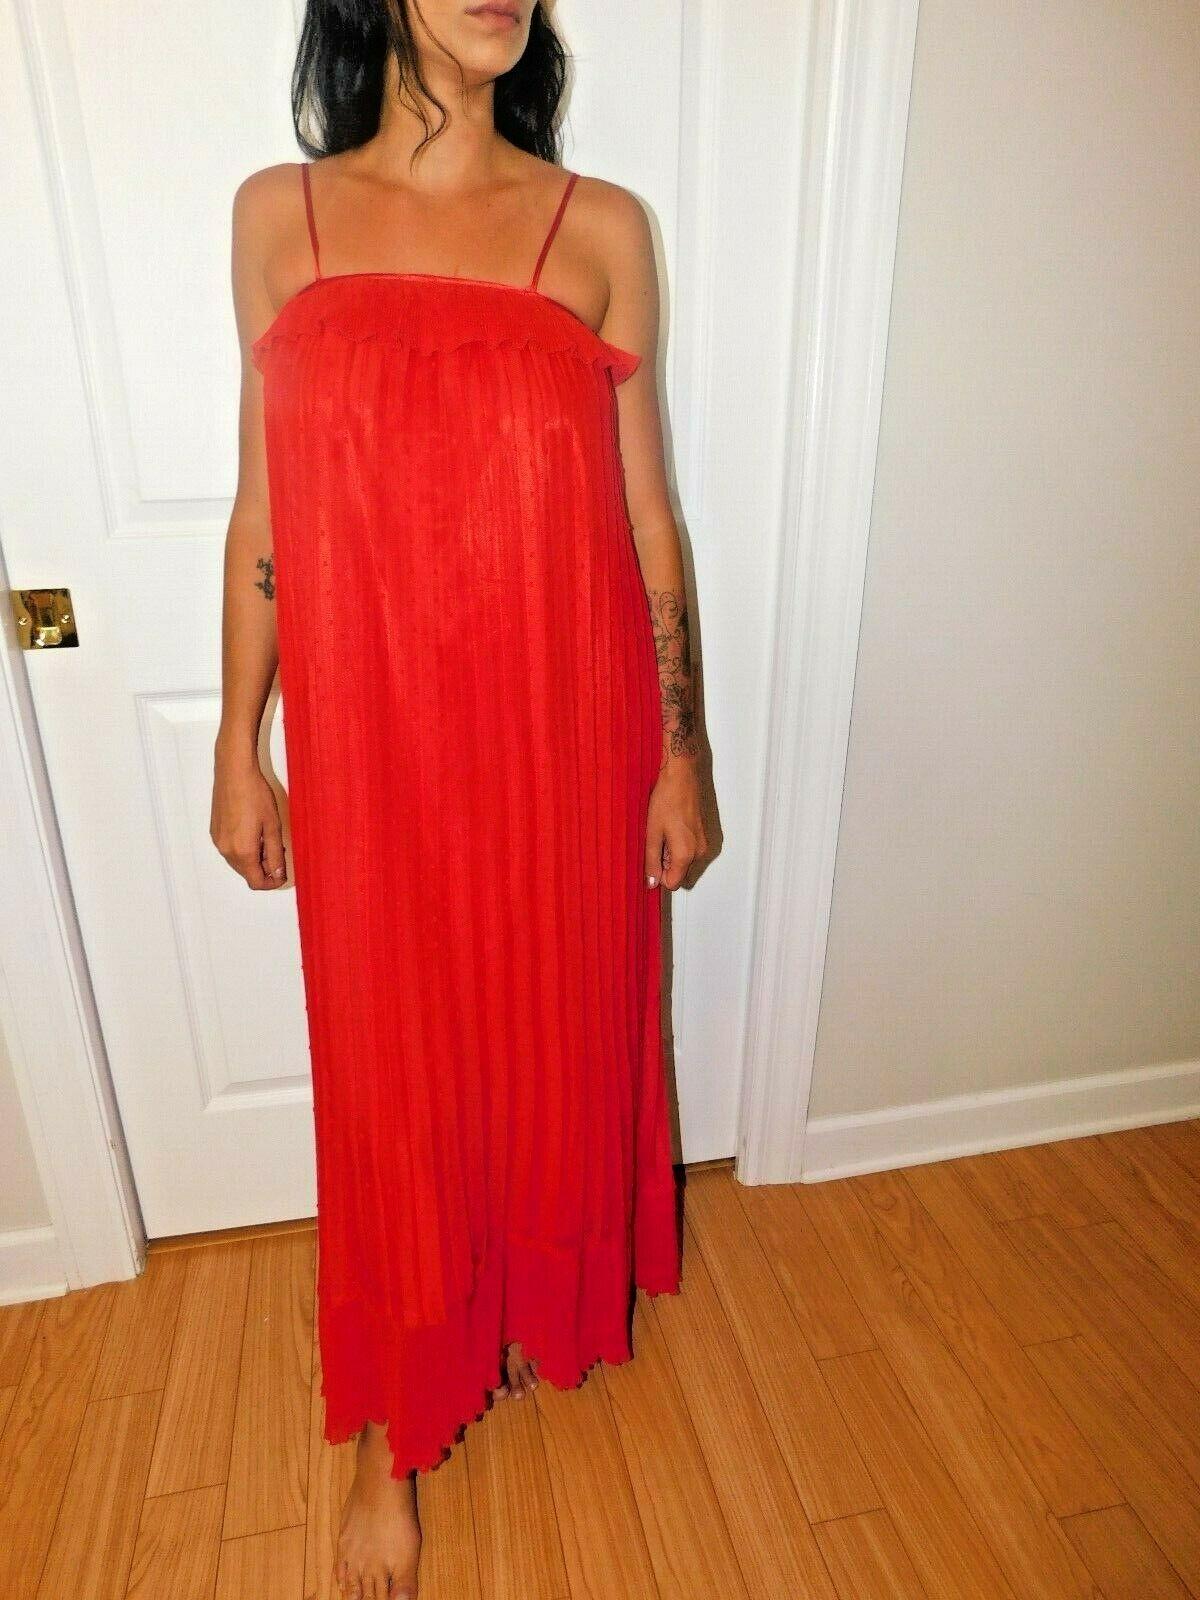 FREE GENERATION PLEATED SLEEVELESS MAXI DRESS SIZE XS NWT $220